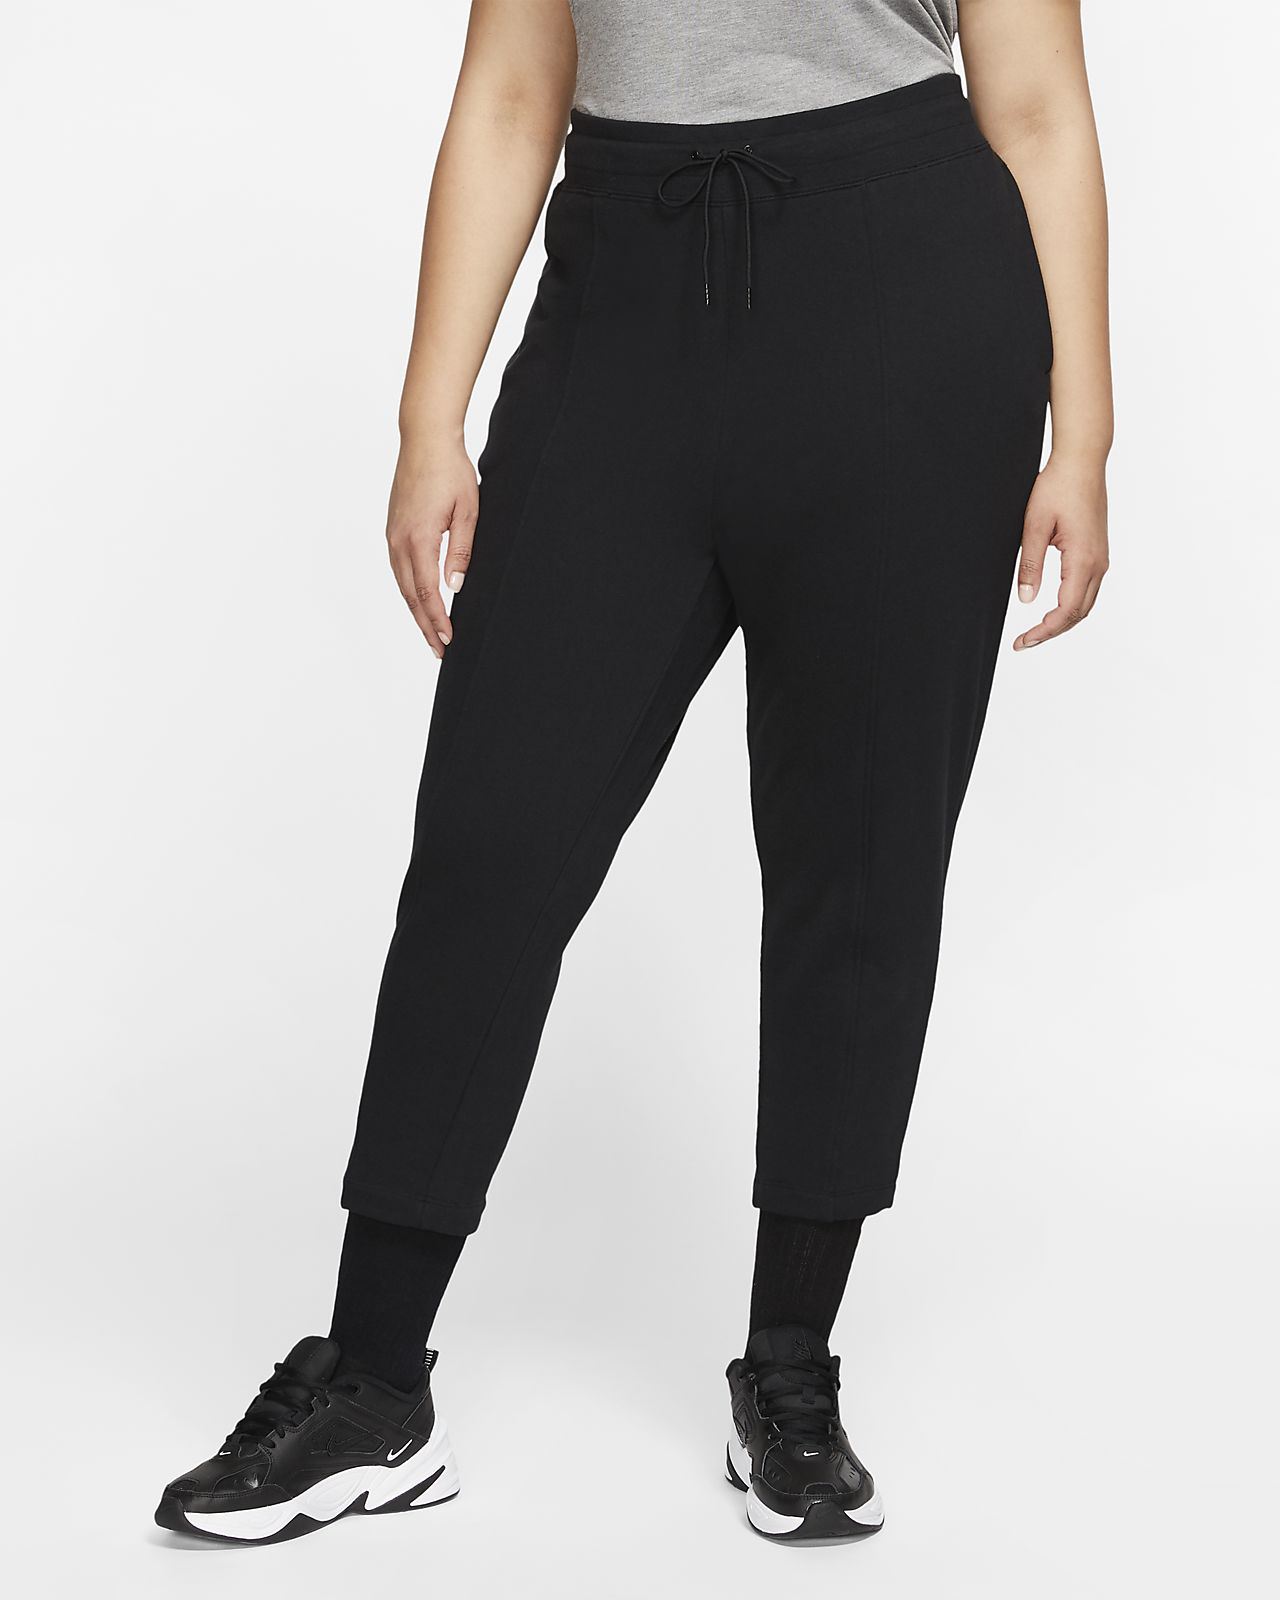 Pantalón Sportswear Terrytallas GrandesMujer Swoosh Nike French De Tejido 4Rqj3AL5